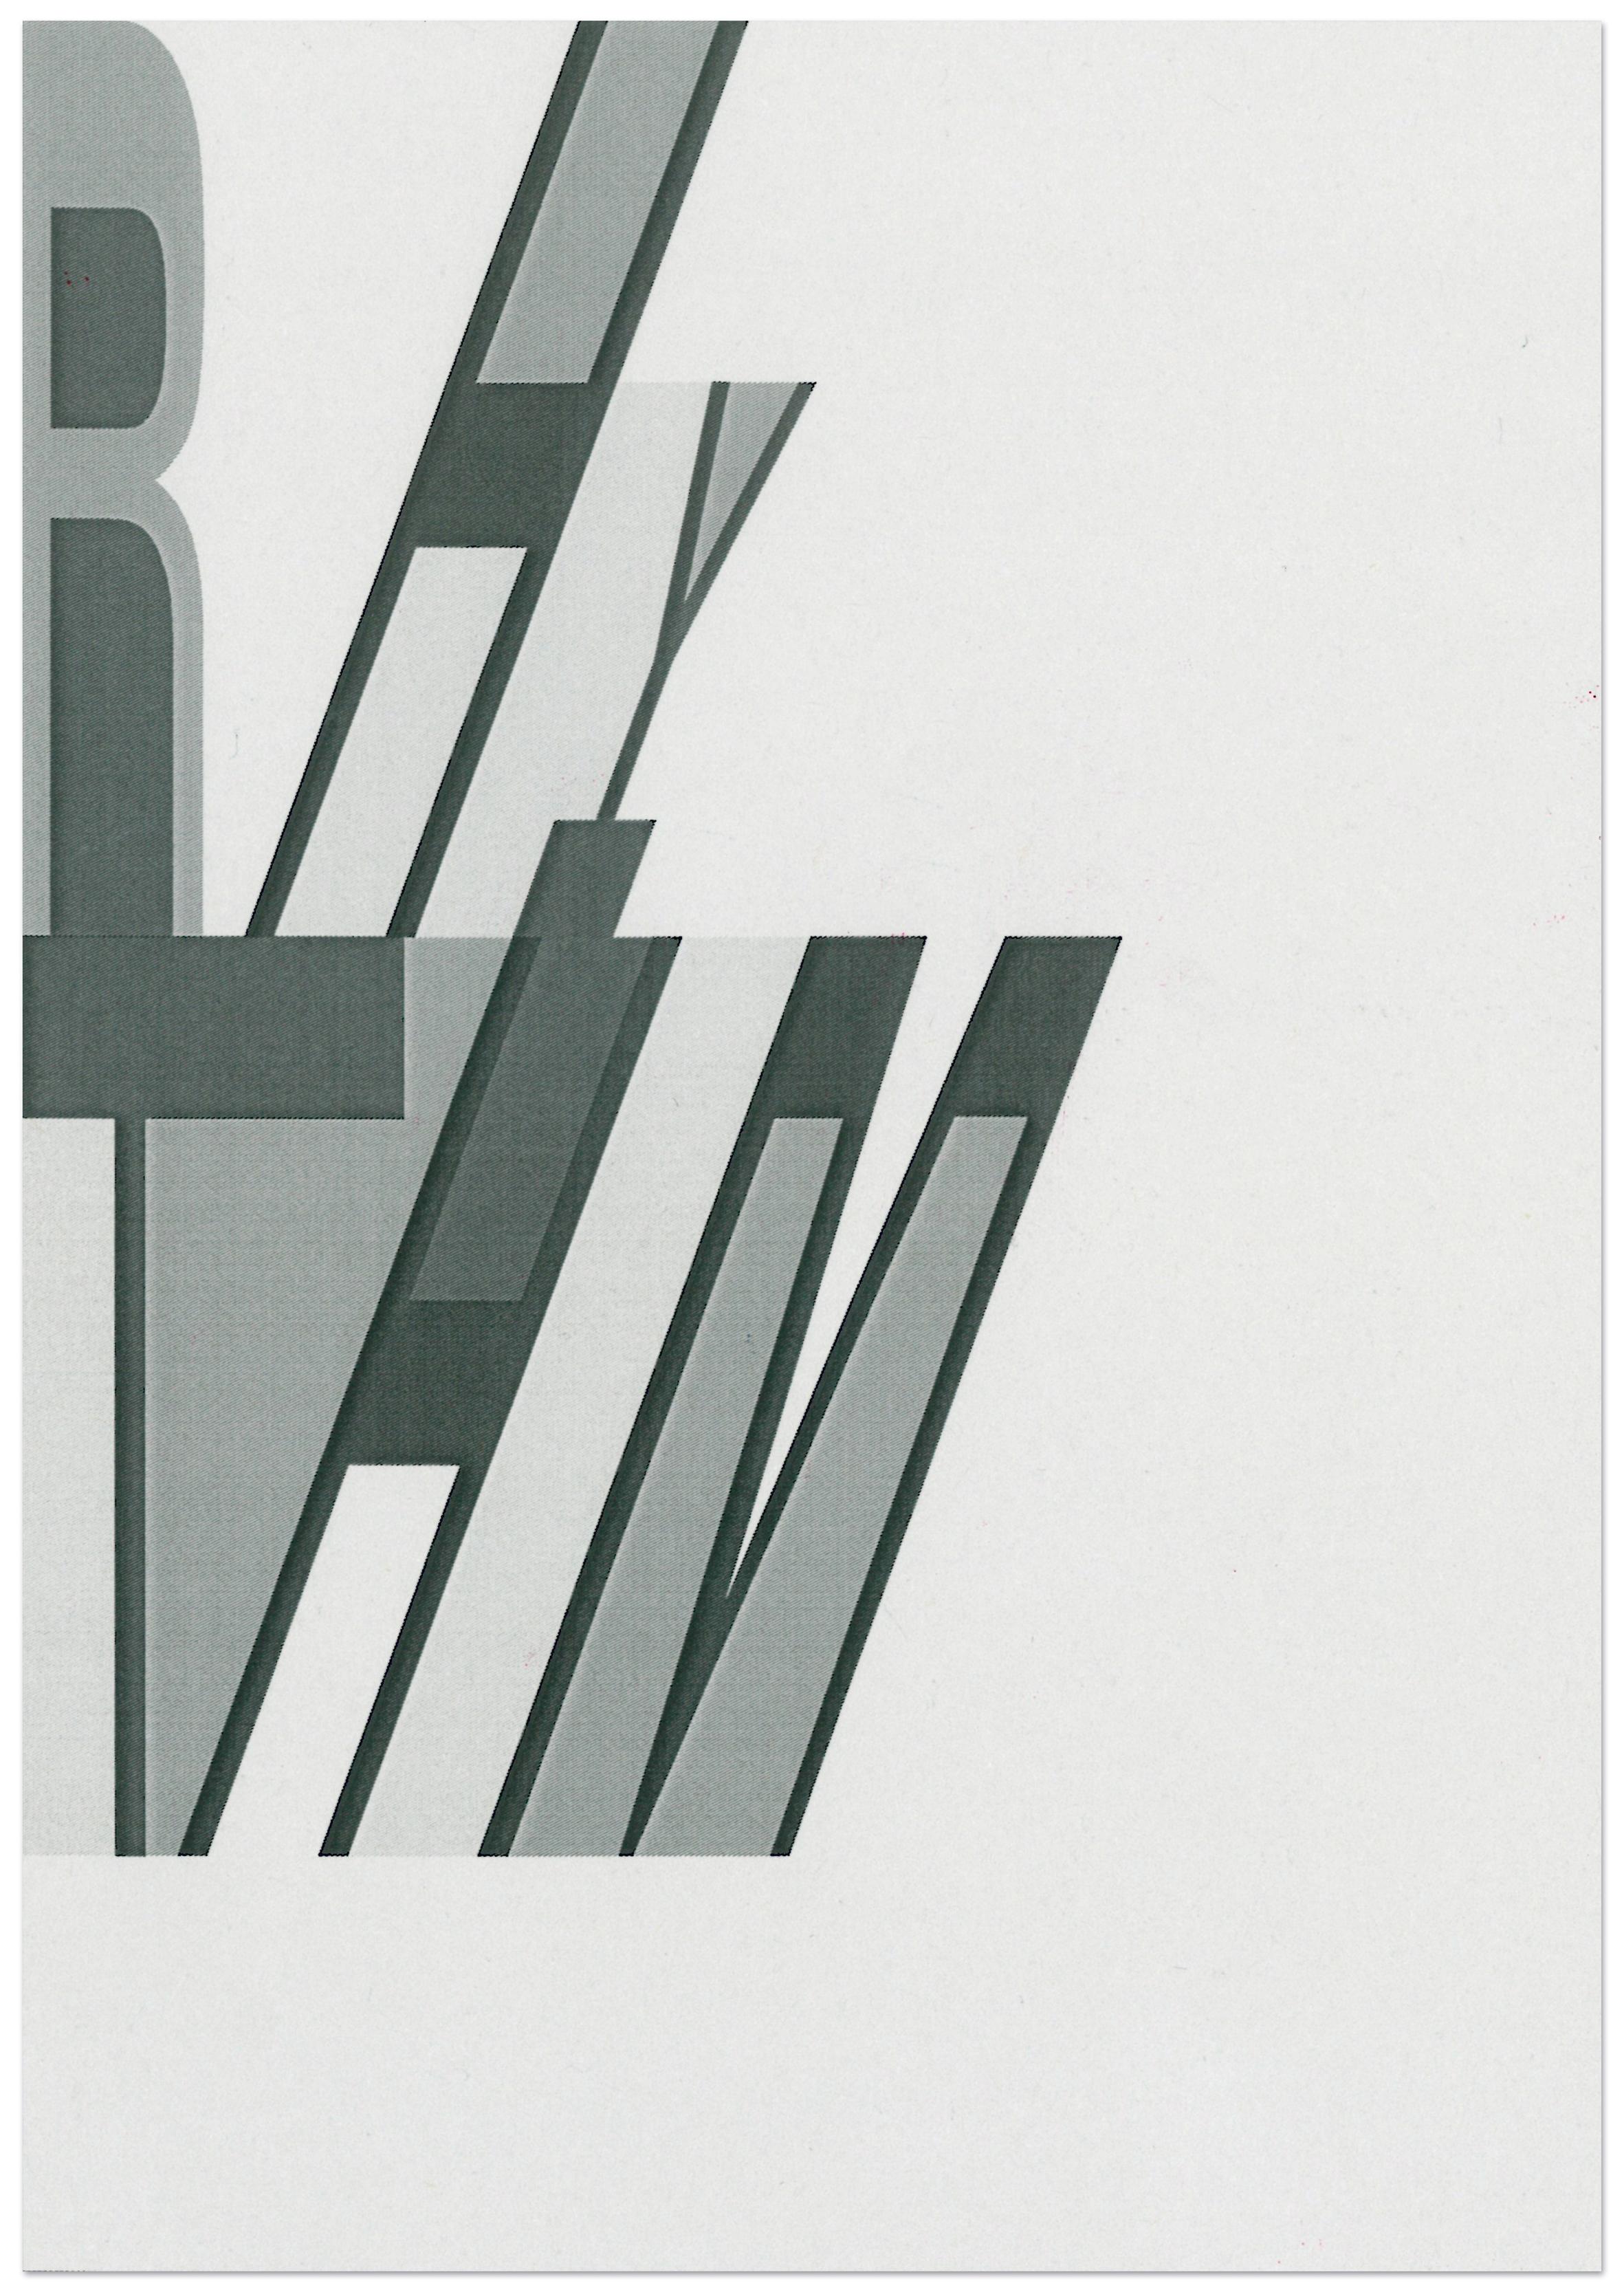 Rhythm typography composition